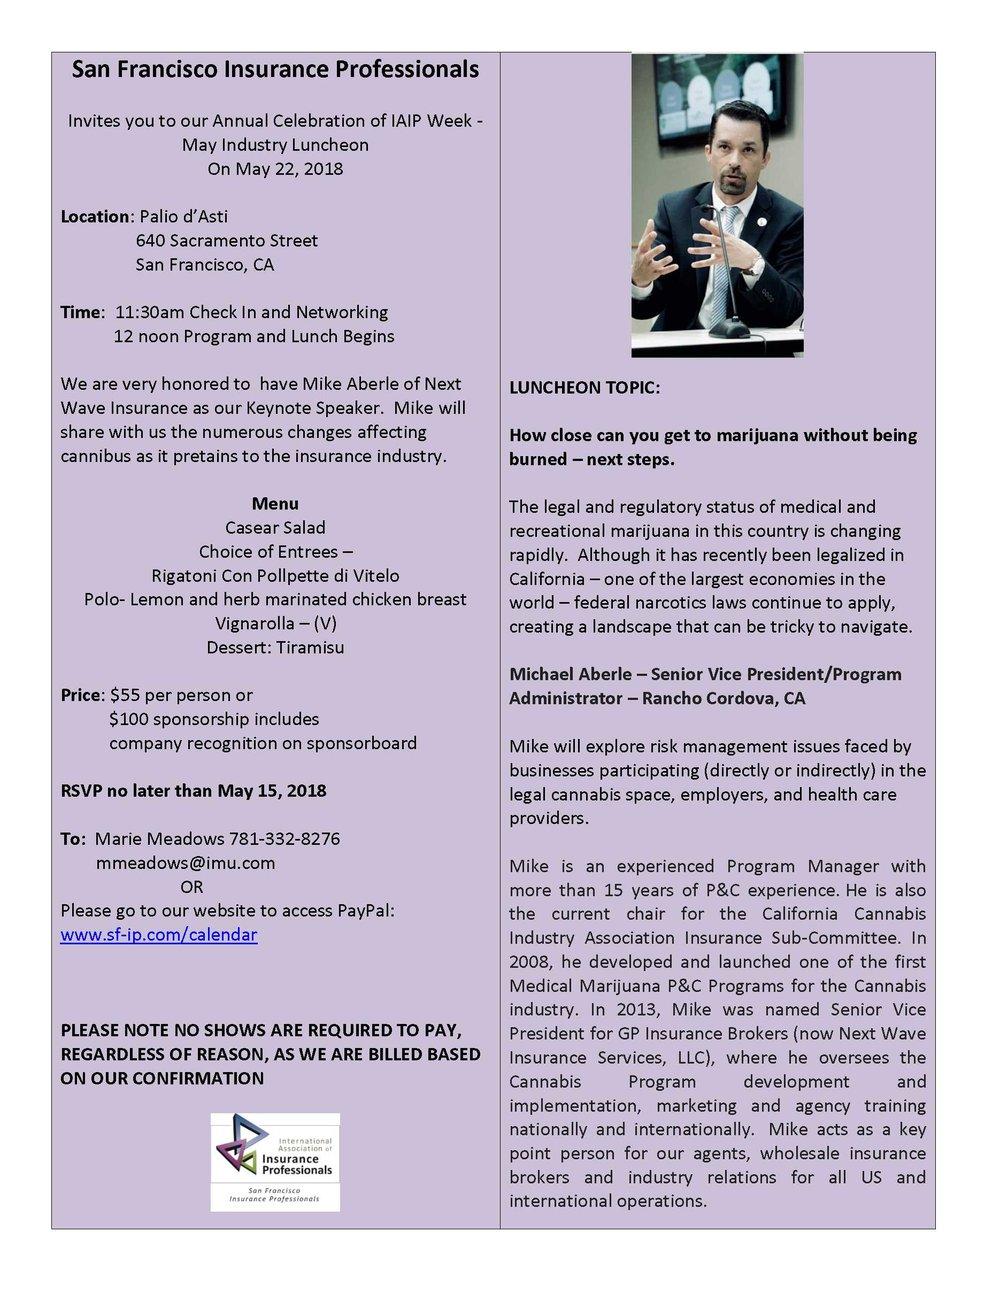 2018-05-22 SFIP May Luncheon Flyer.jpg